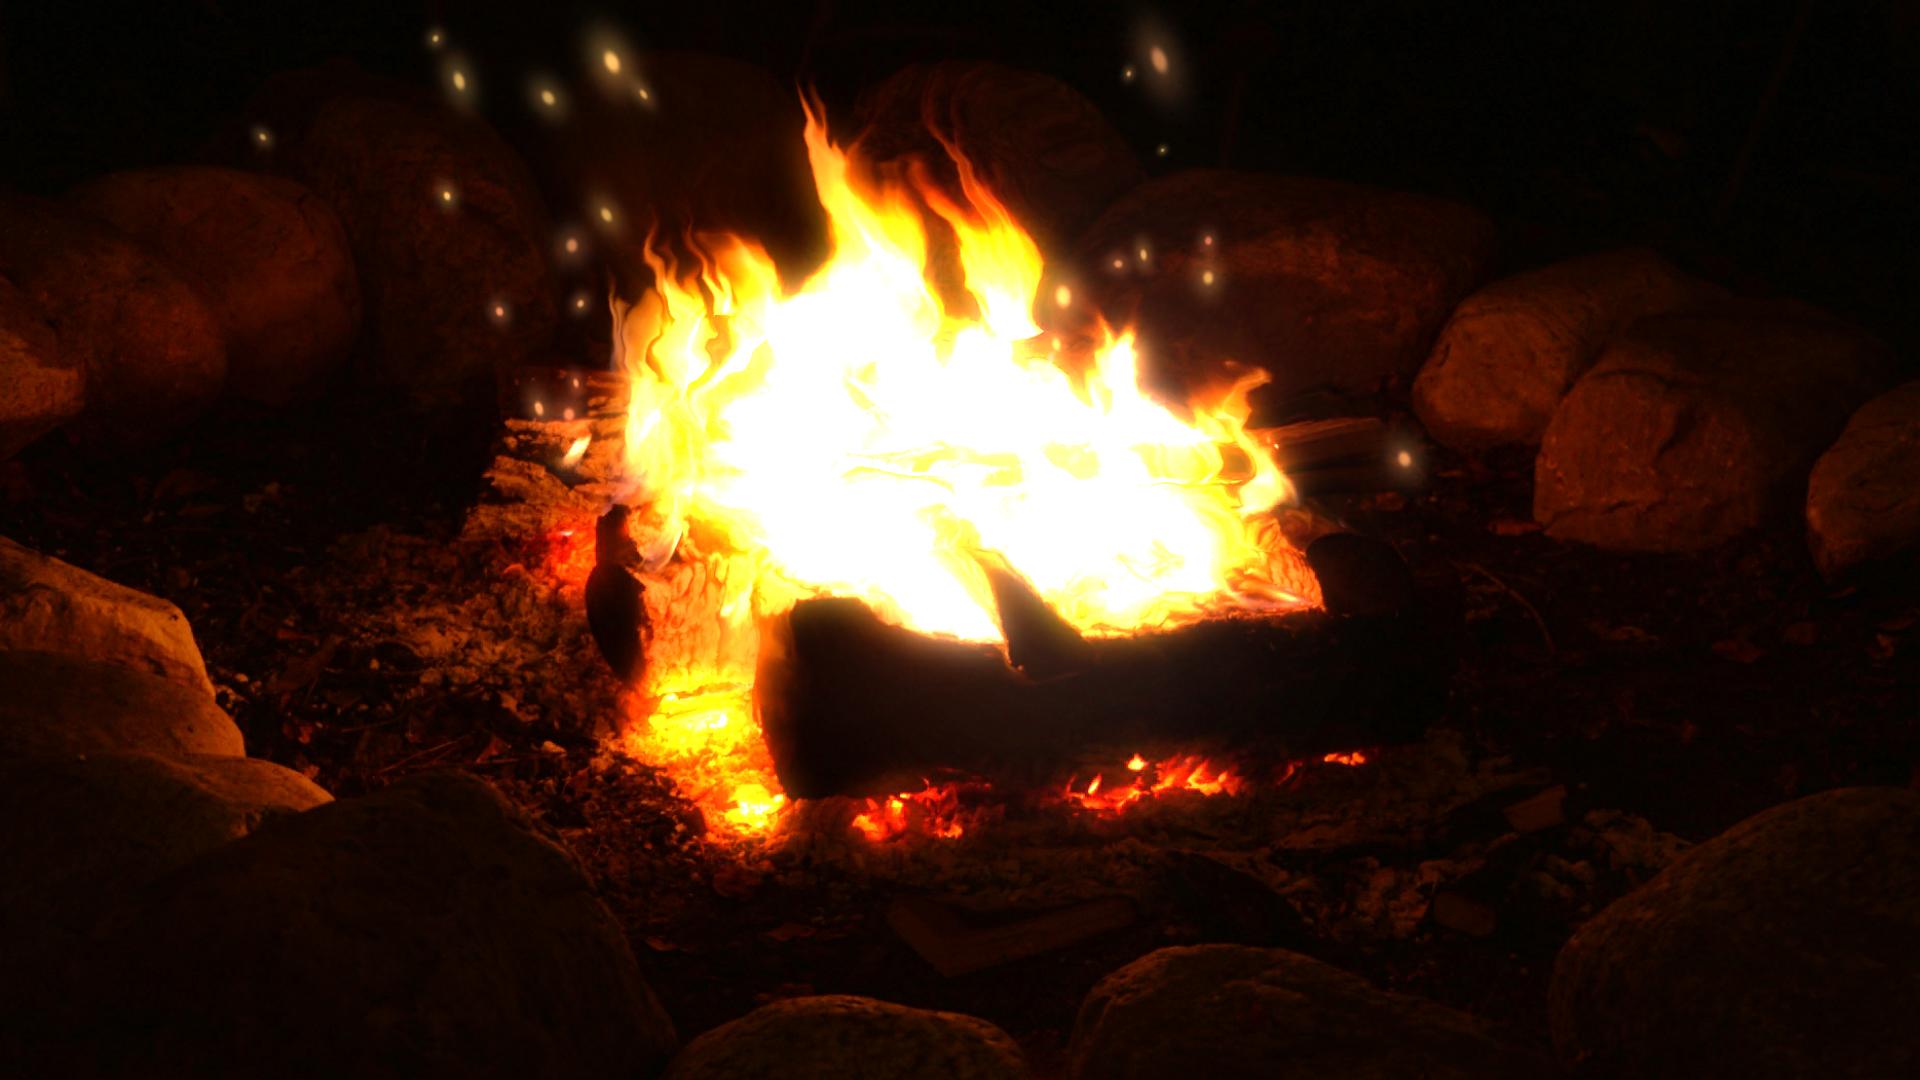 Campfire Wallpaper Engine